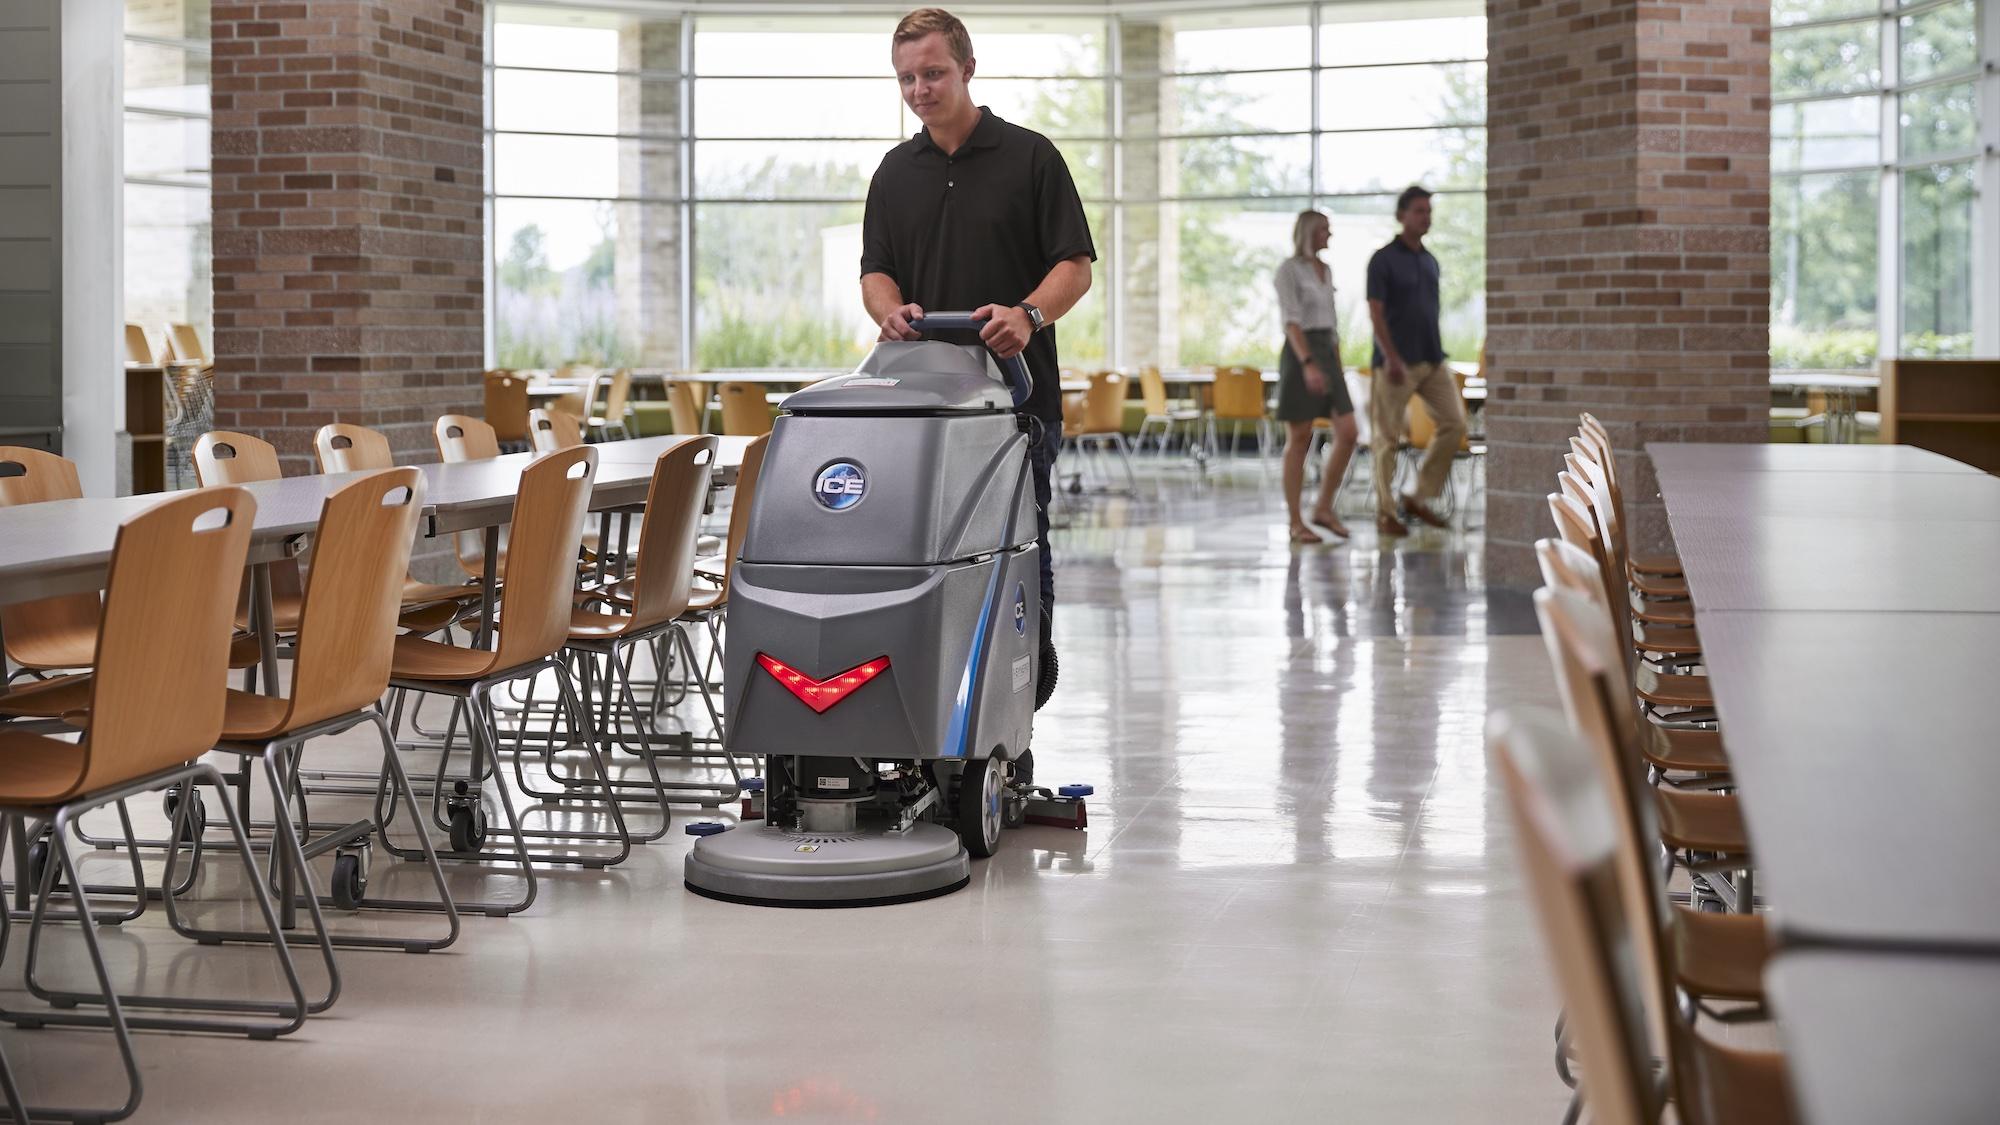 Machine operator pushing the i20btl scrubber through school cafeteria